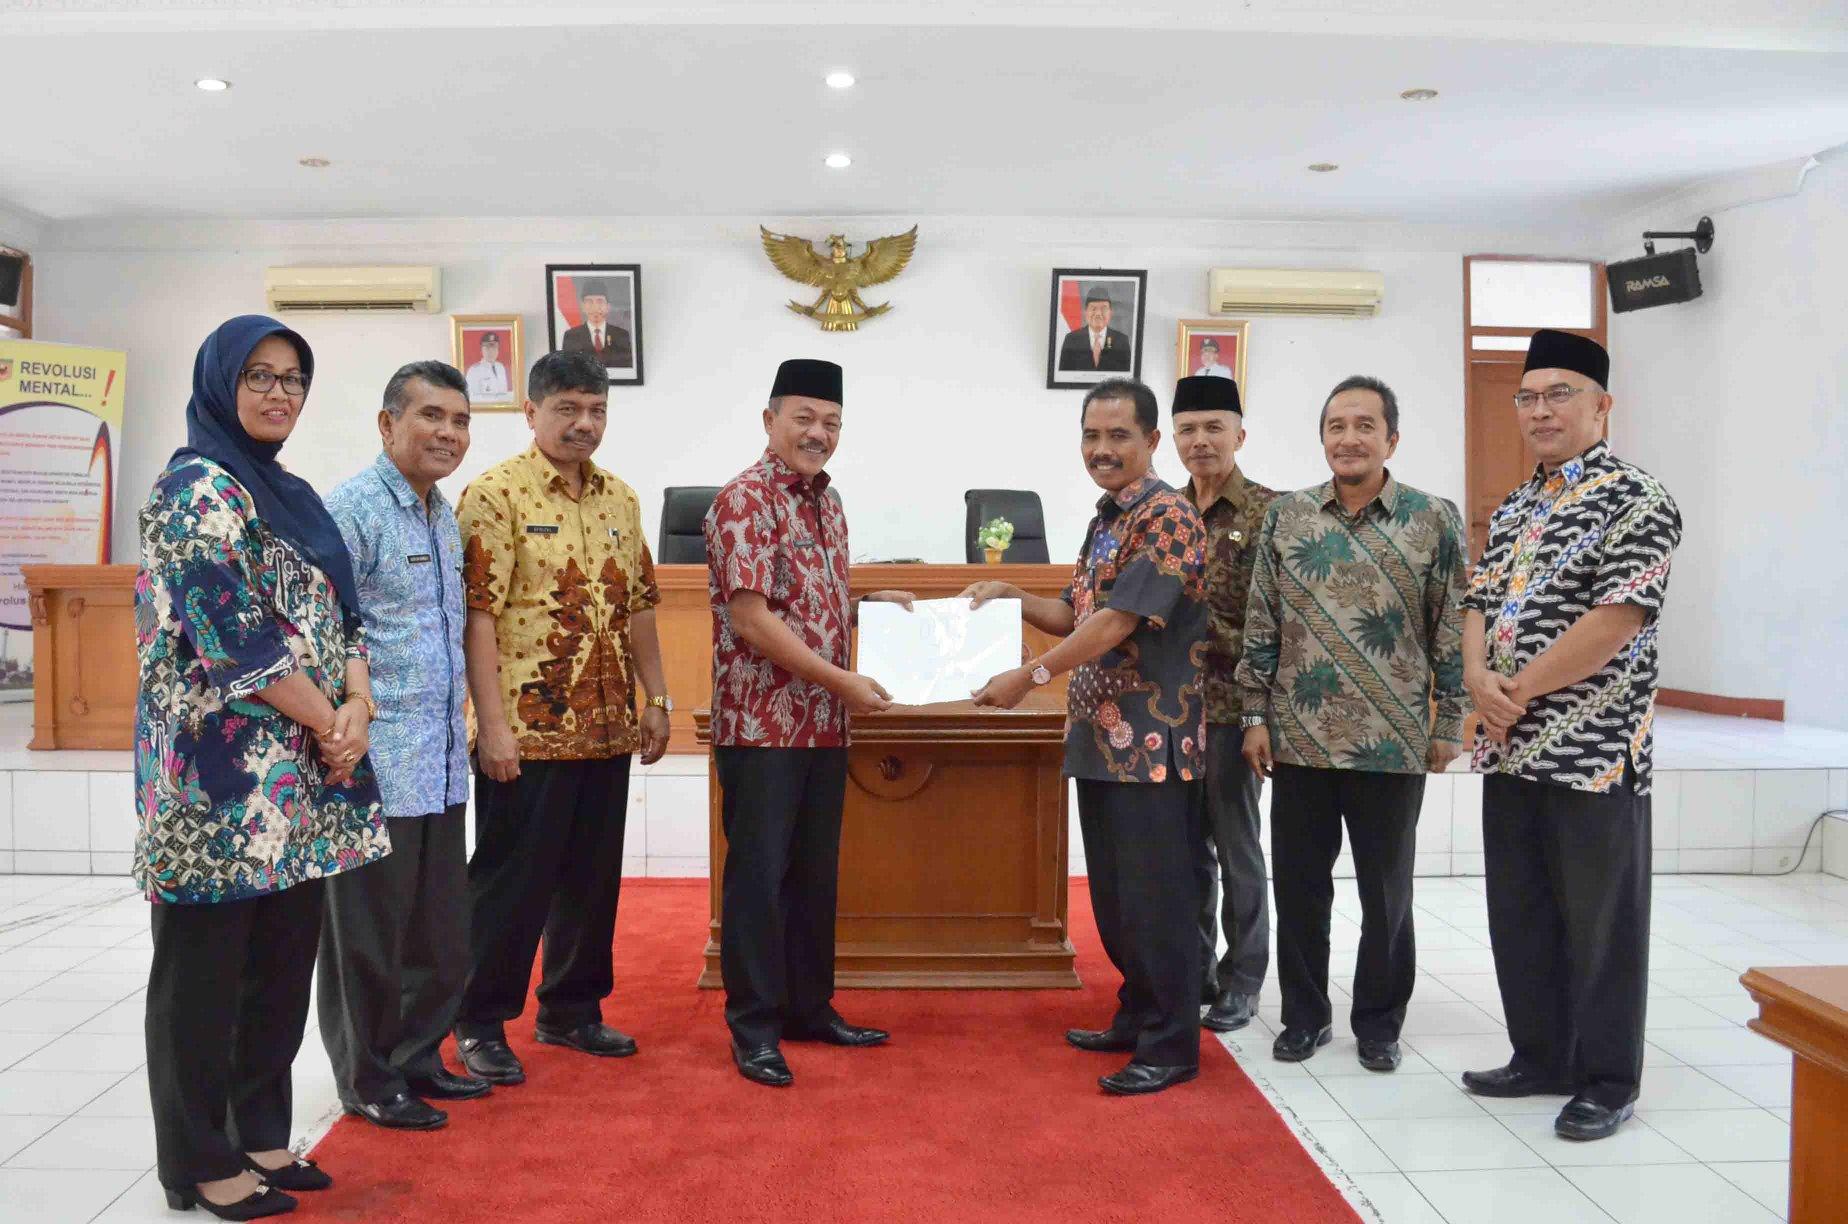 Wabup Tanah Datar Zuldafri Darma menyerahkan SPPT PBB-P2 dan DHKP Kabupaten Tanah Datar tahun 2018